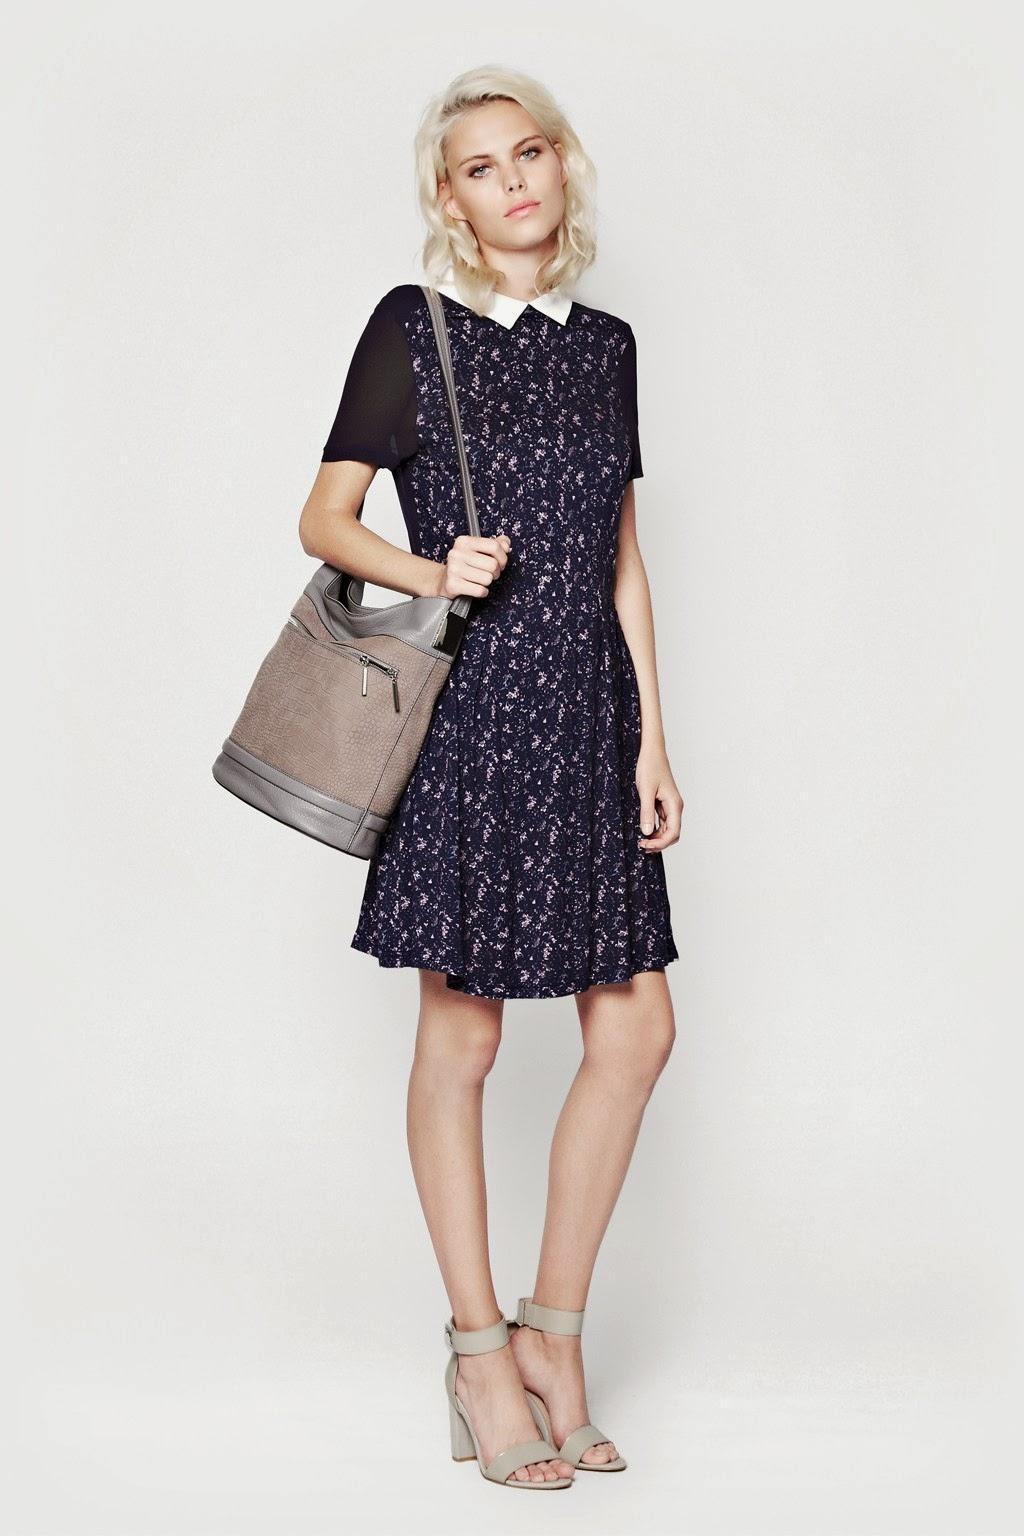 navy collared dress